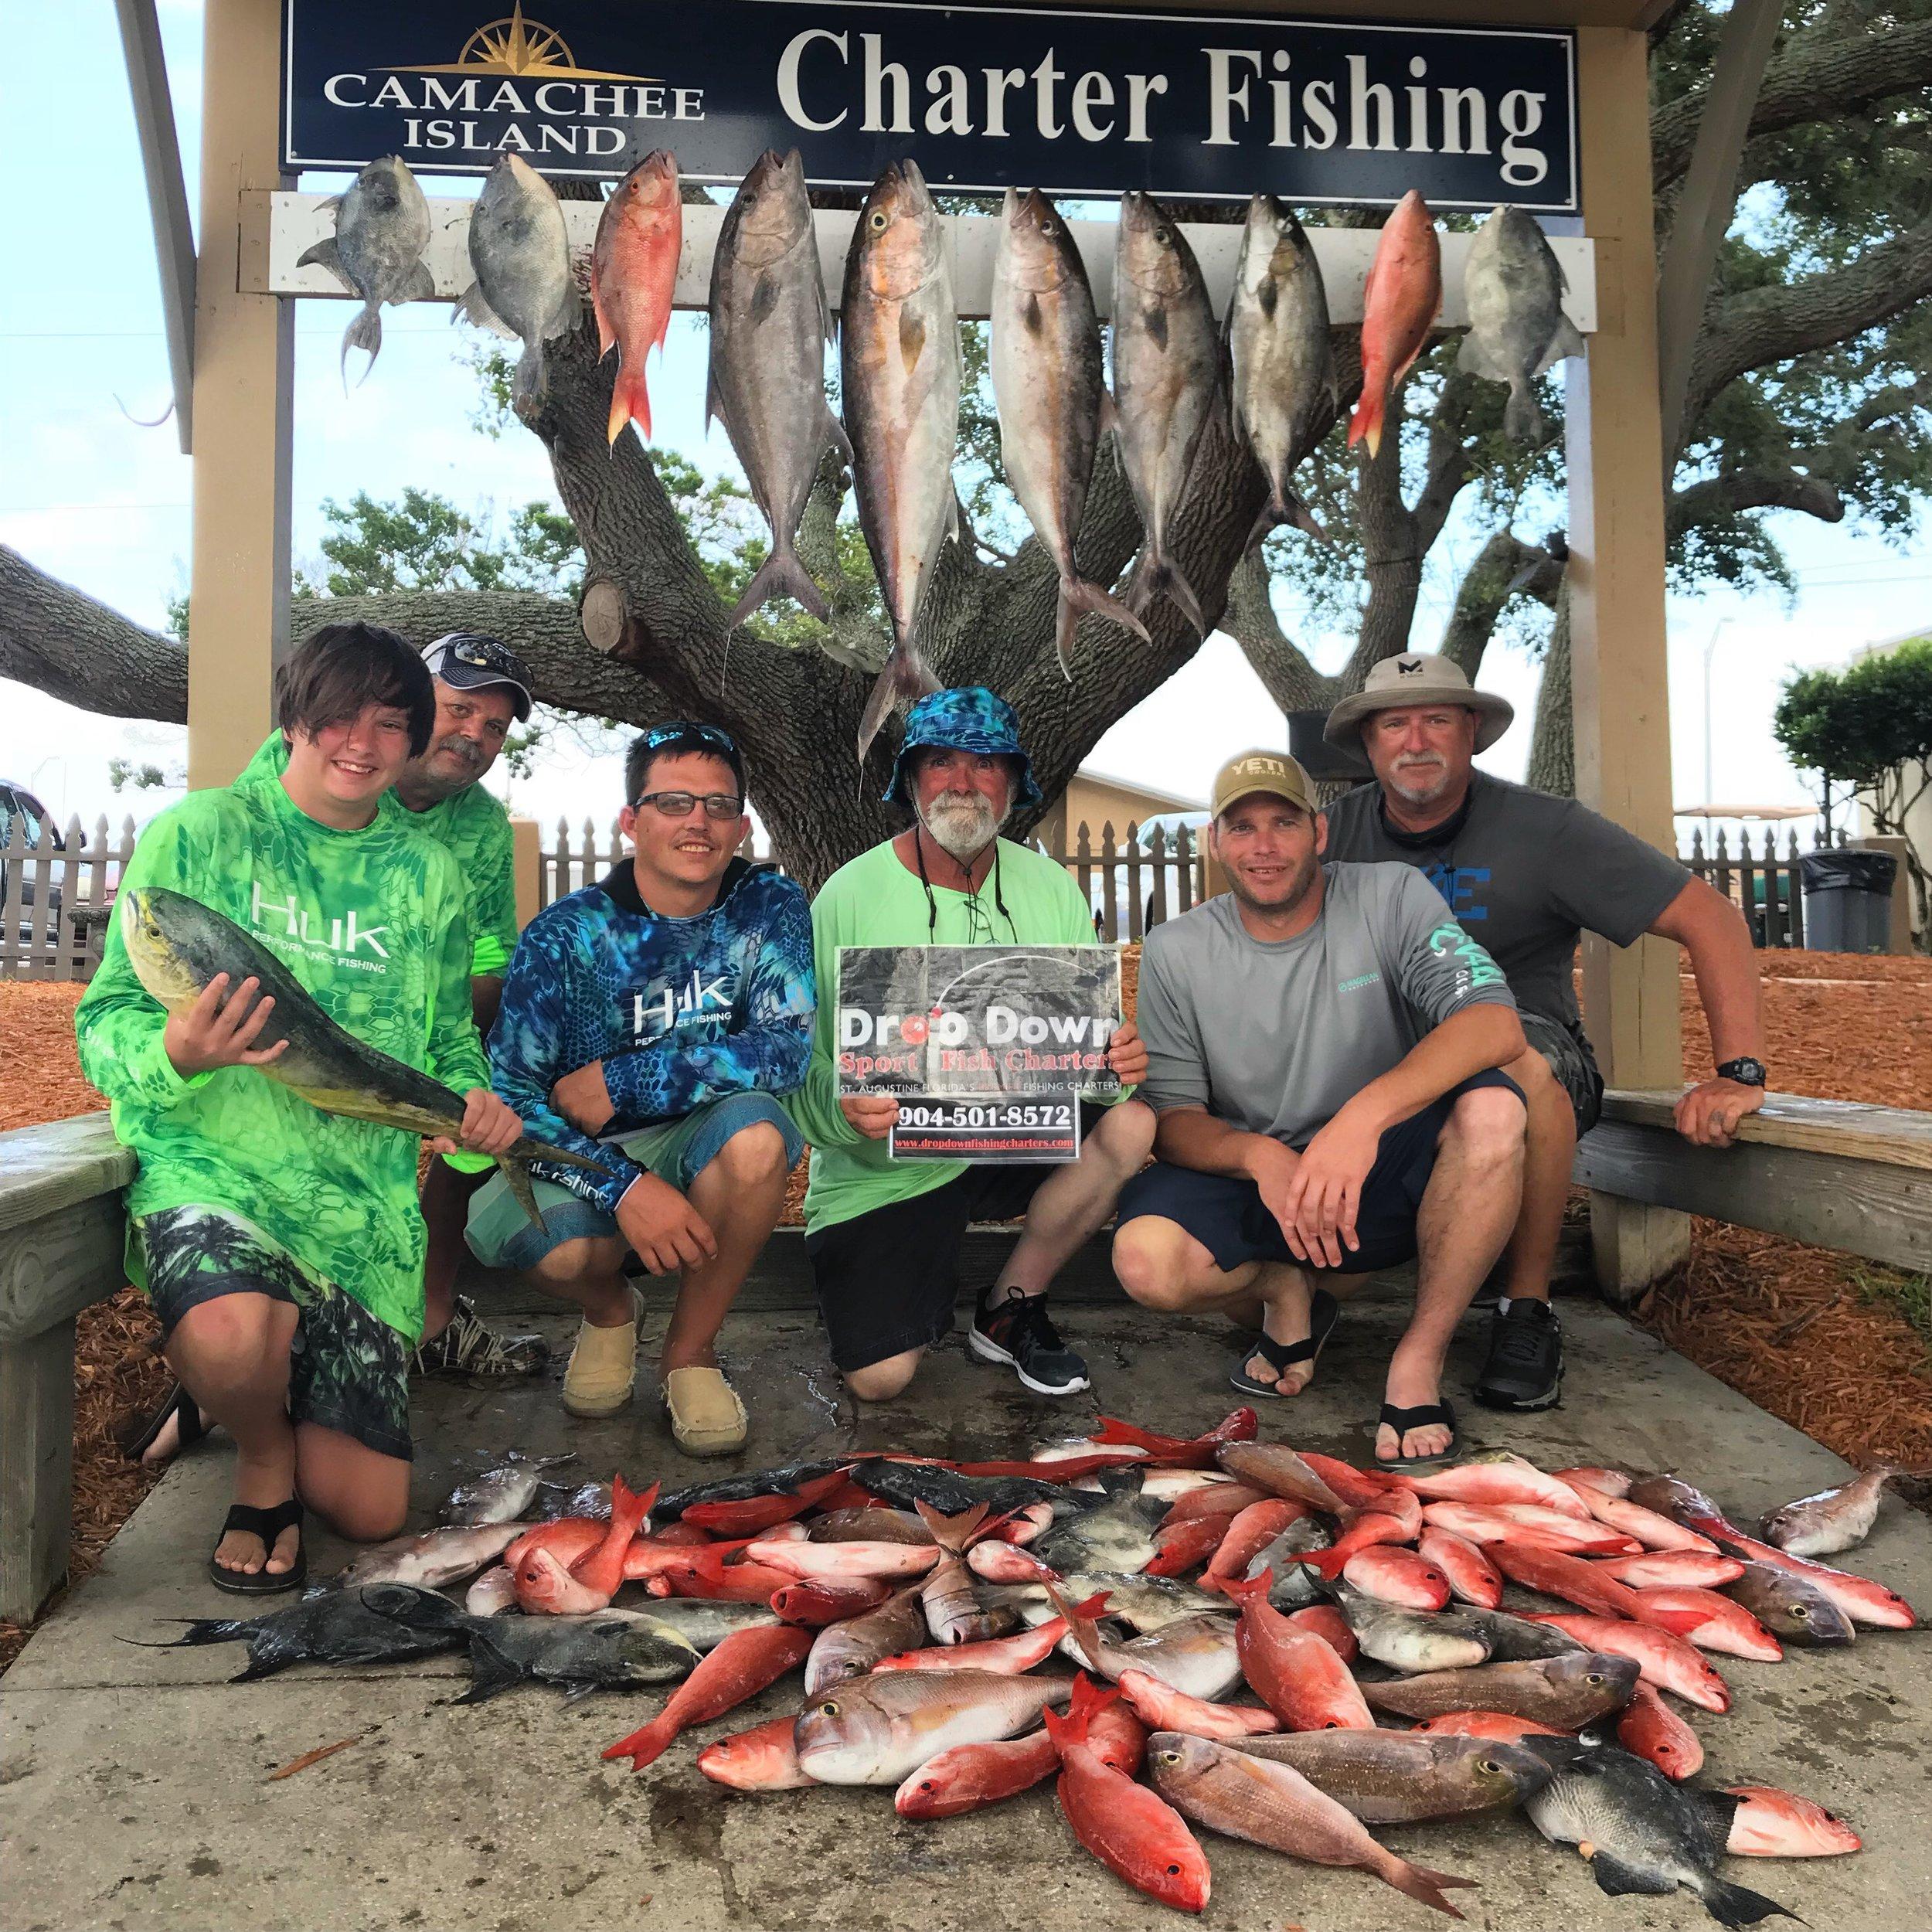 St-Augustine-Charter-Fishing.jpeg